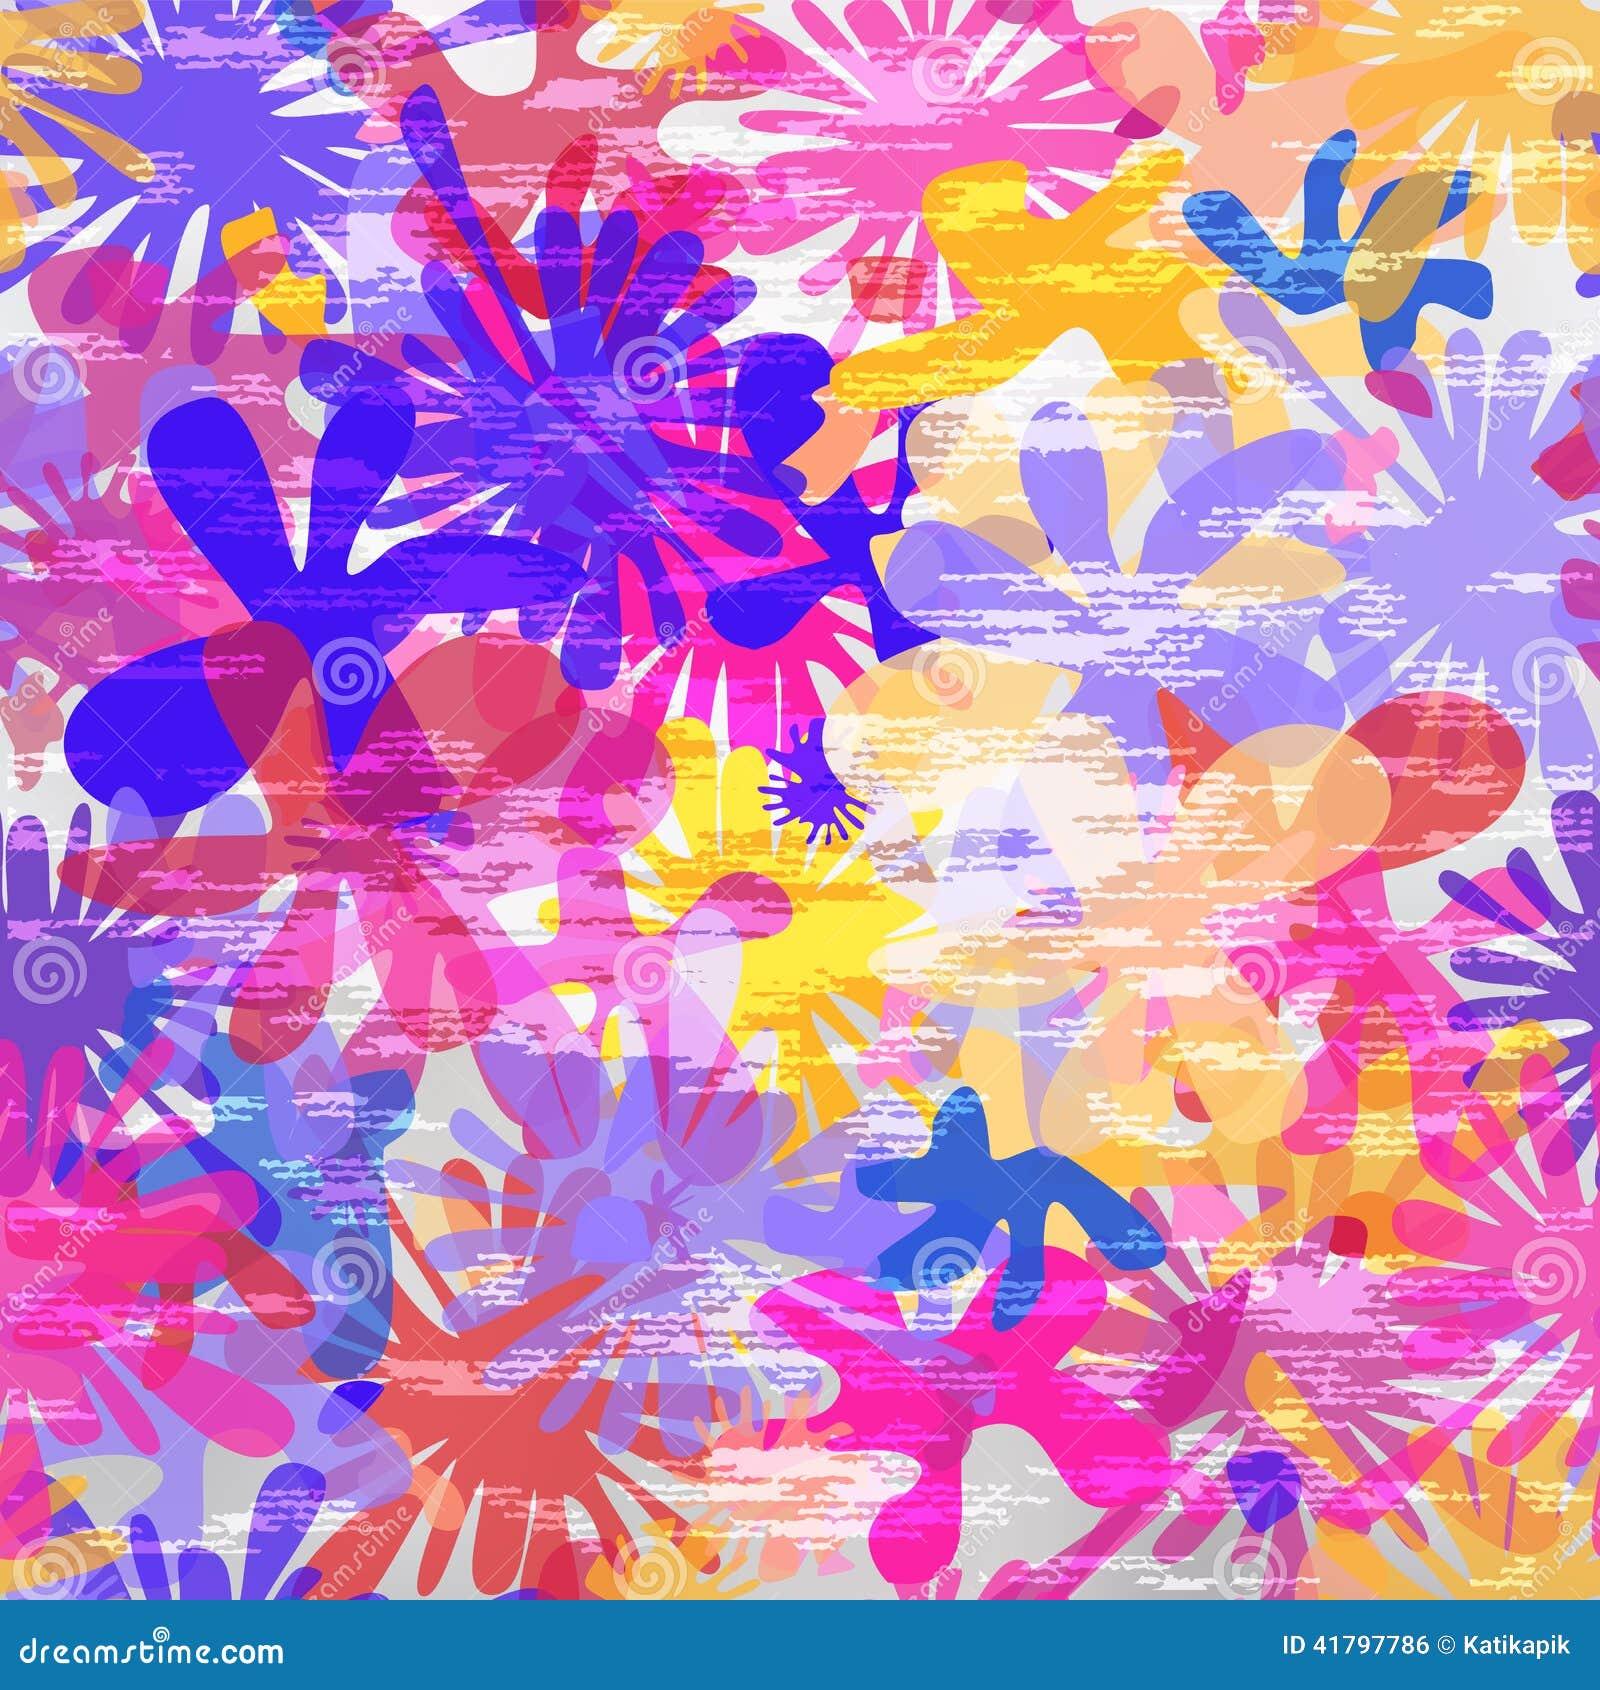 splash background seamless - photo #34